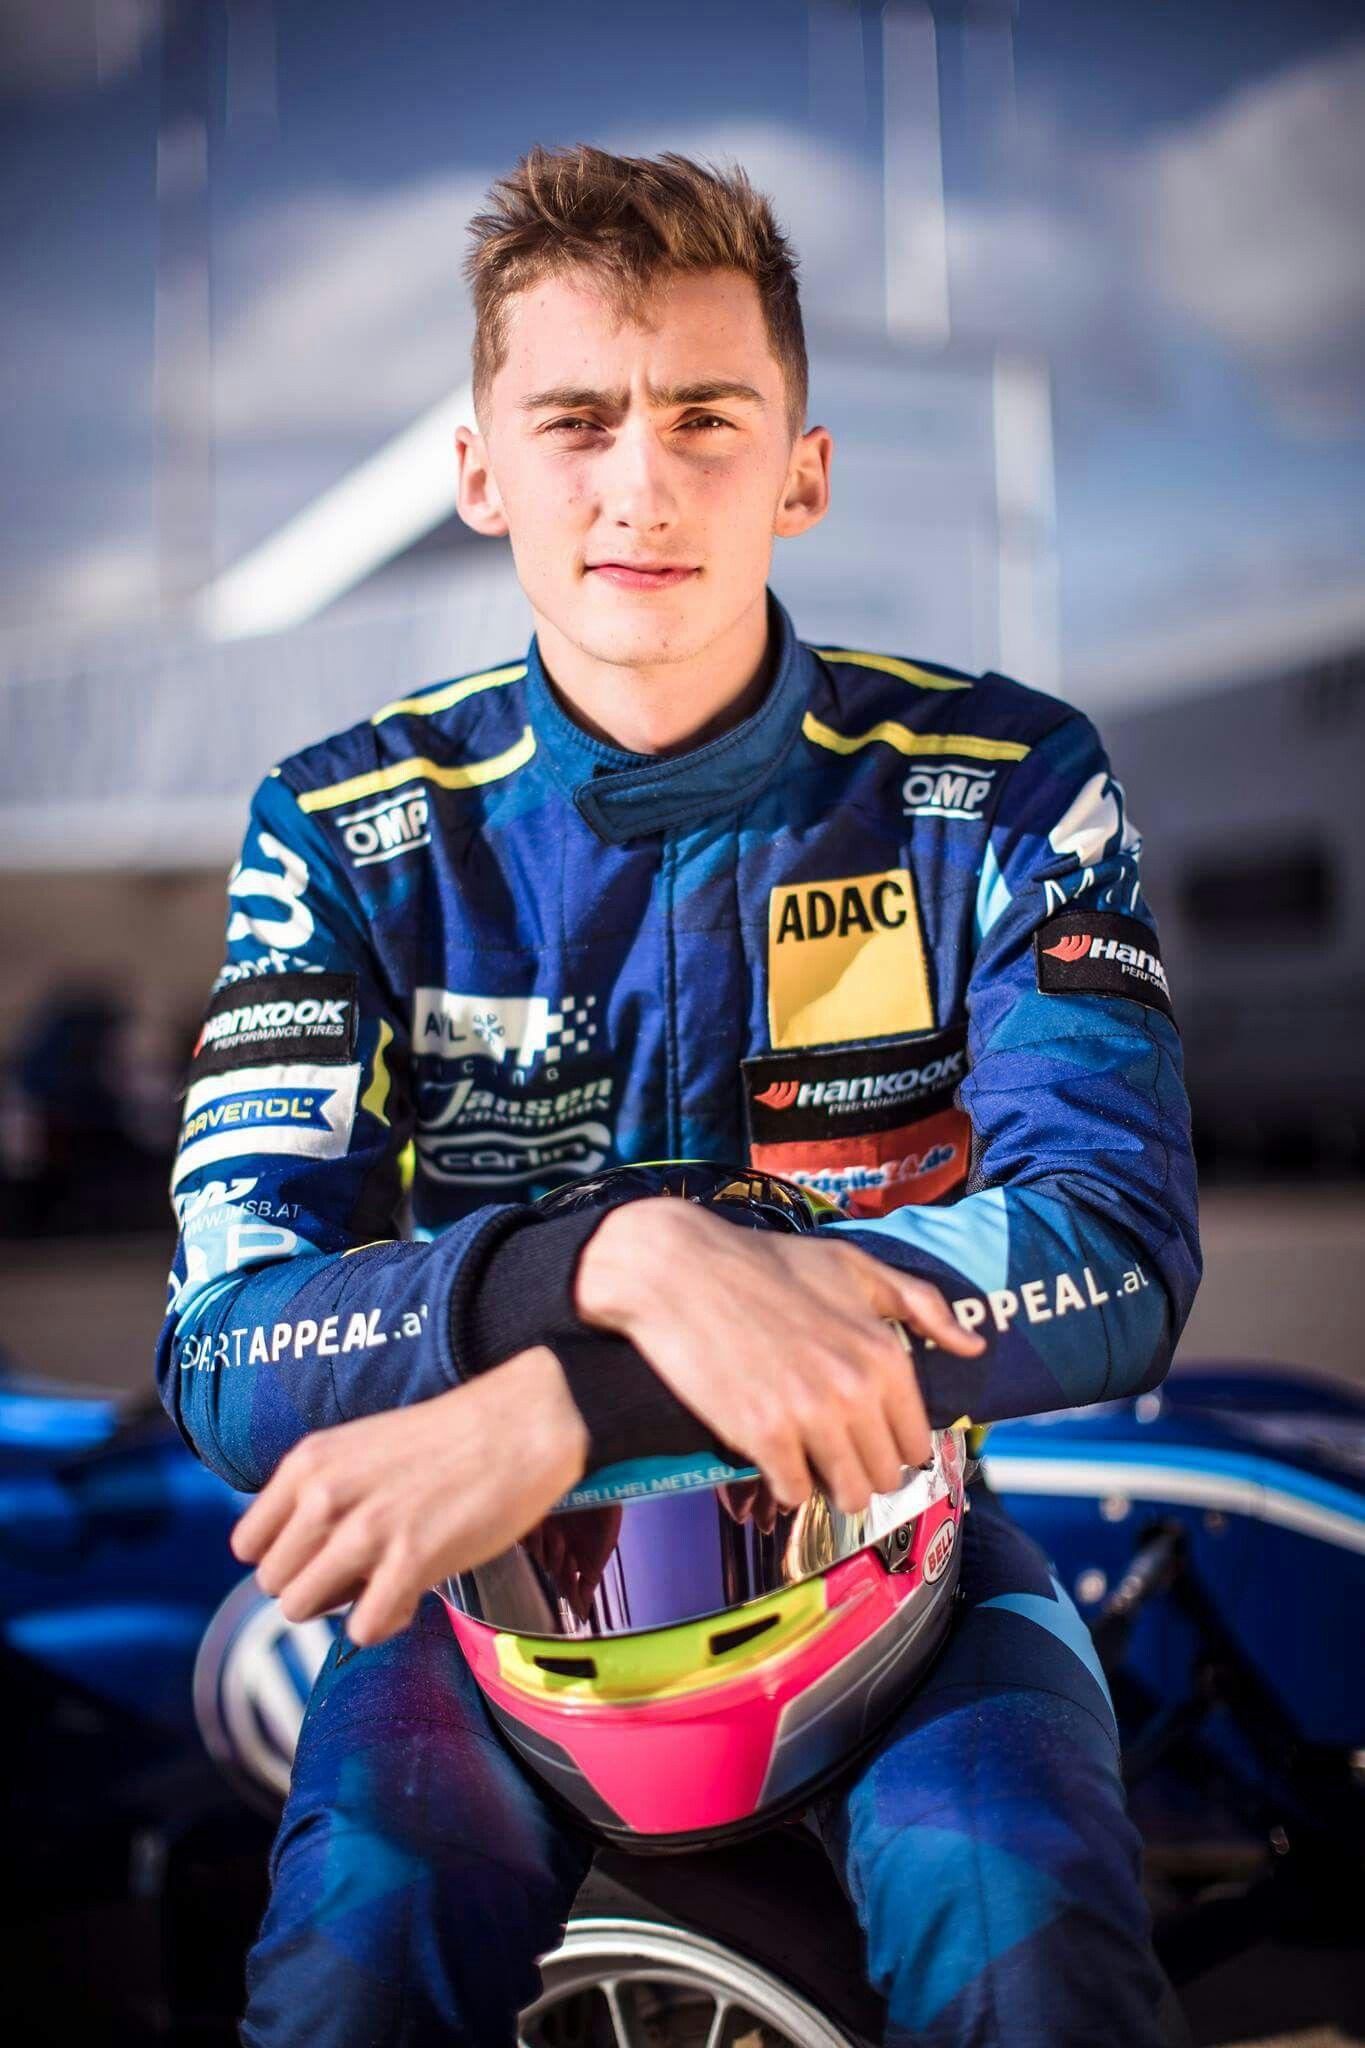 Ferdinand Habsburg, Racing Driver (Aut) For Carlin In Fia F3